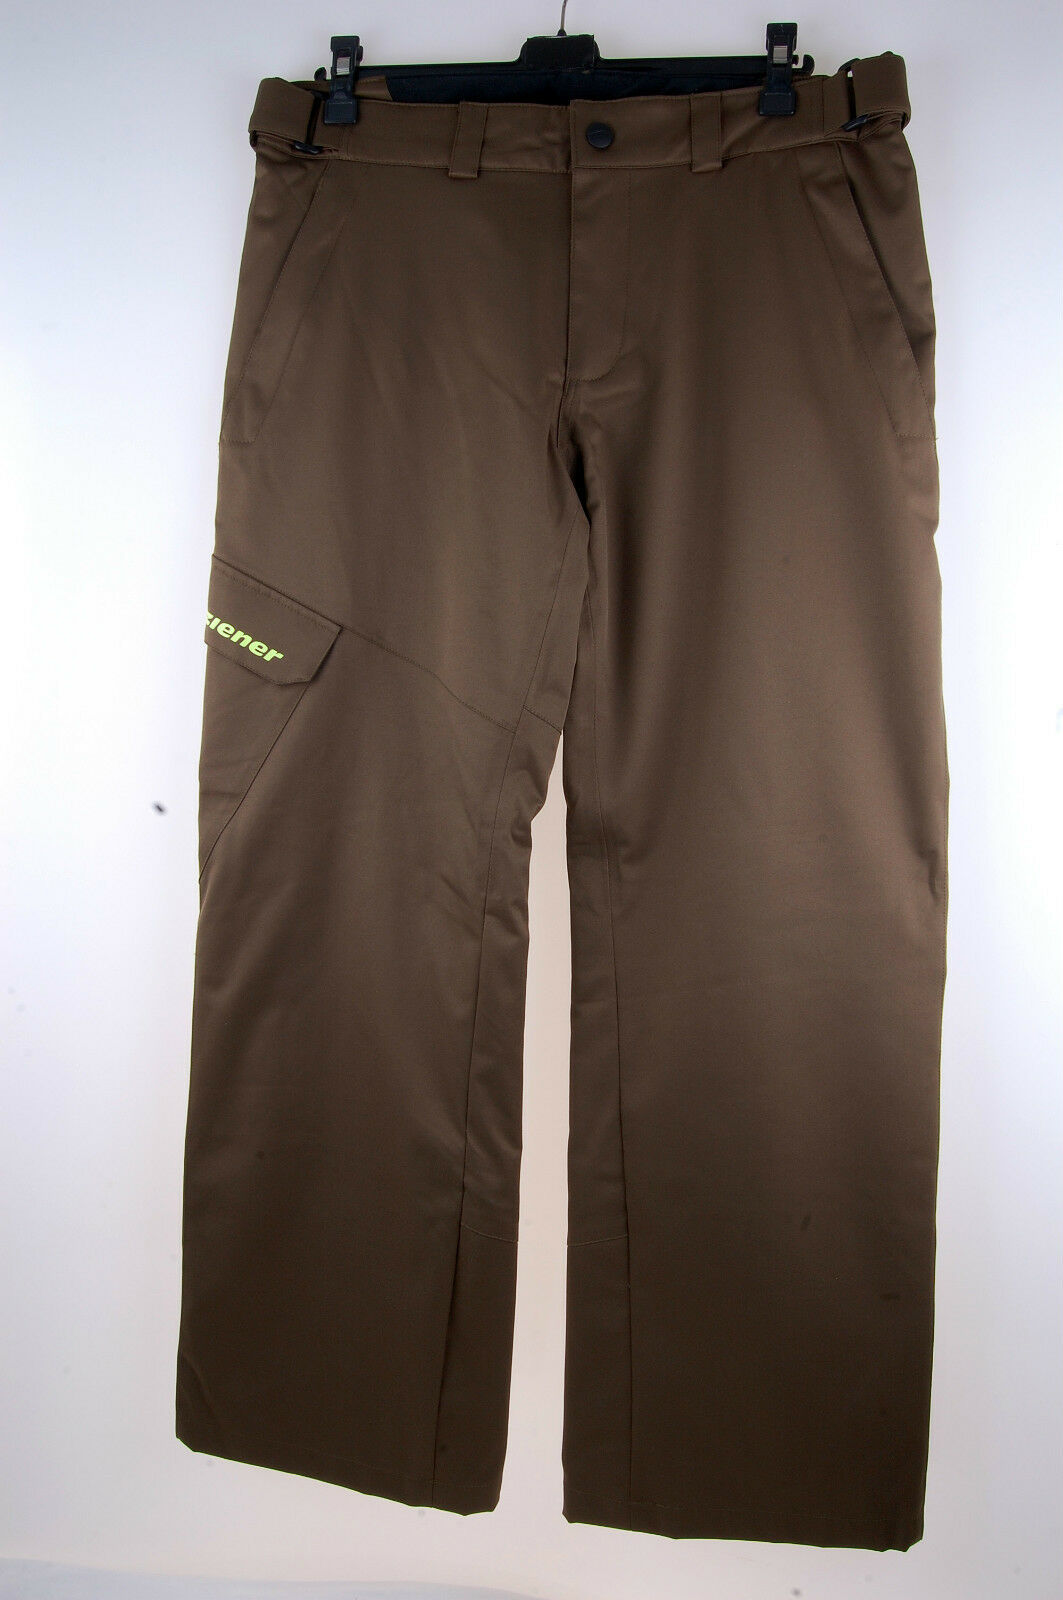 ZIENER Men's Ski Pants Teviot Aqua Shield 10.000 Olive 821 Size 50 NEW